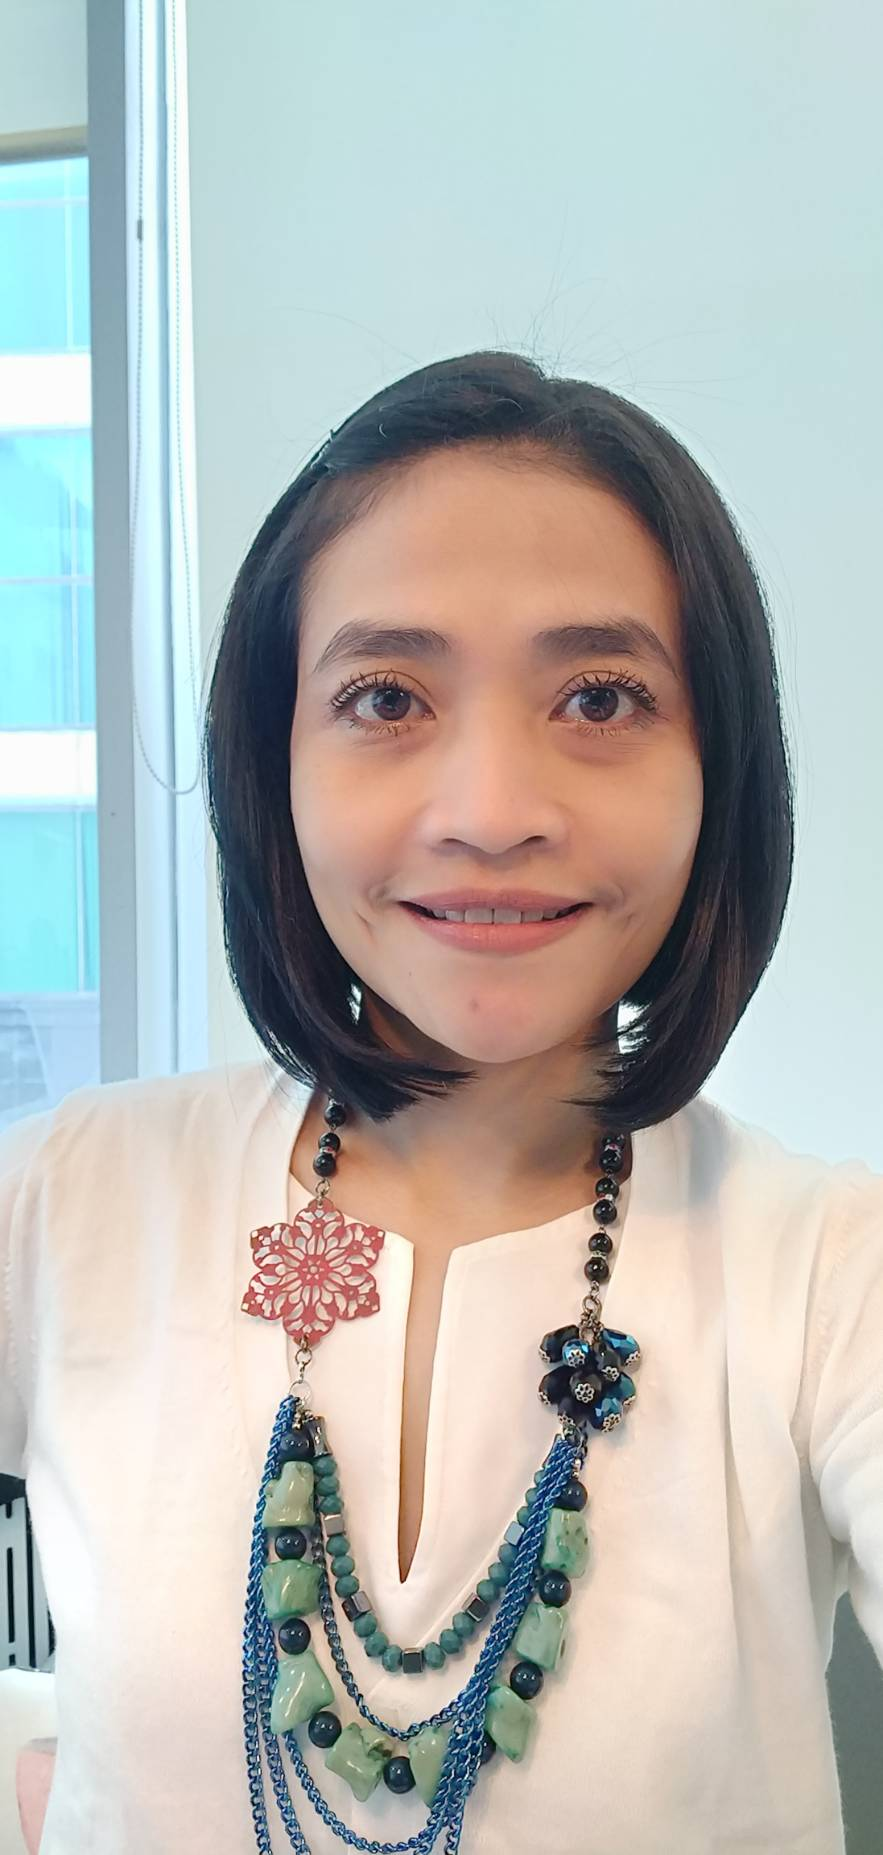 -Indah from Jakarta, Indonesia